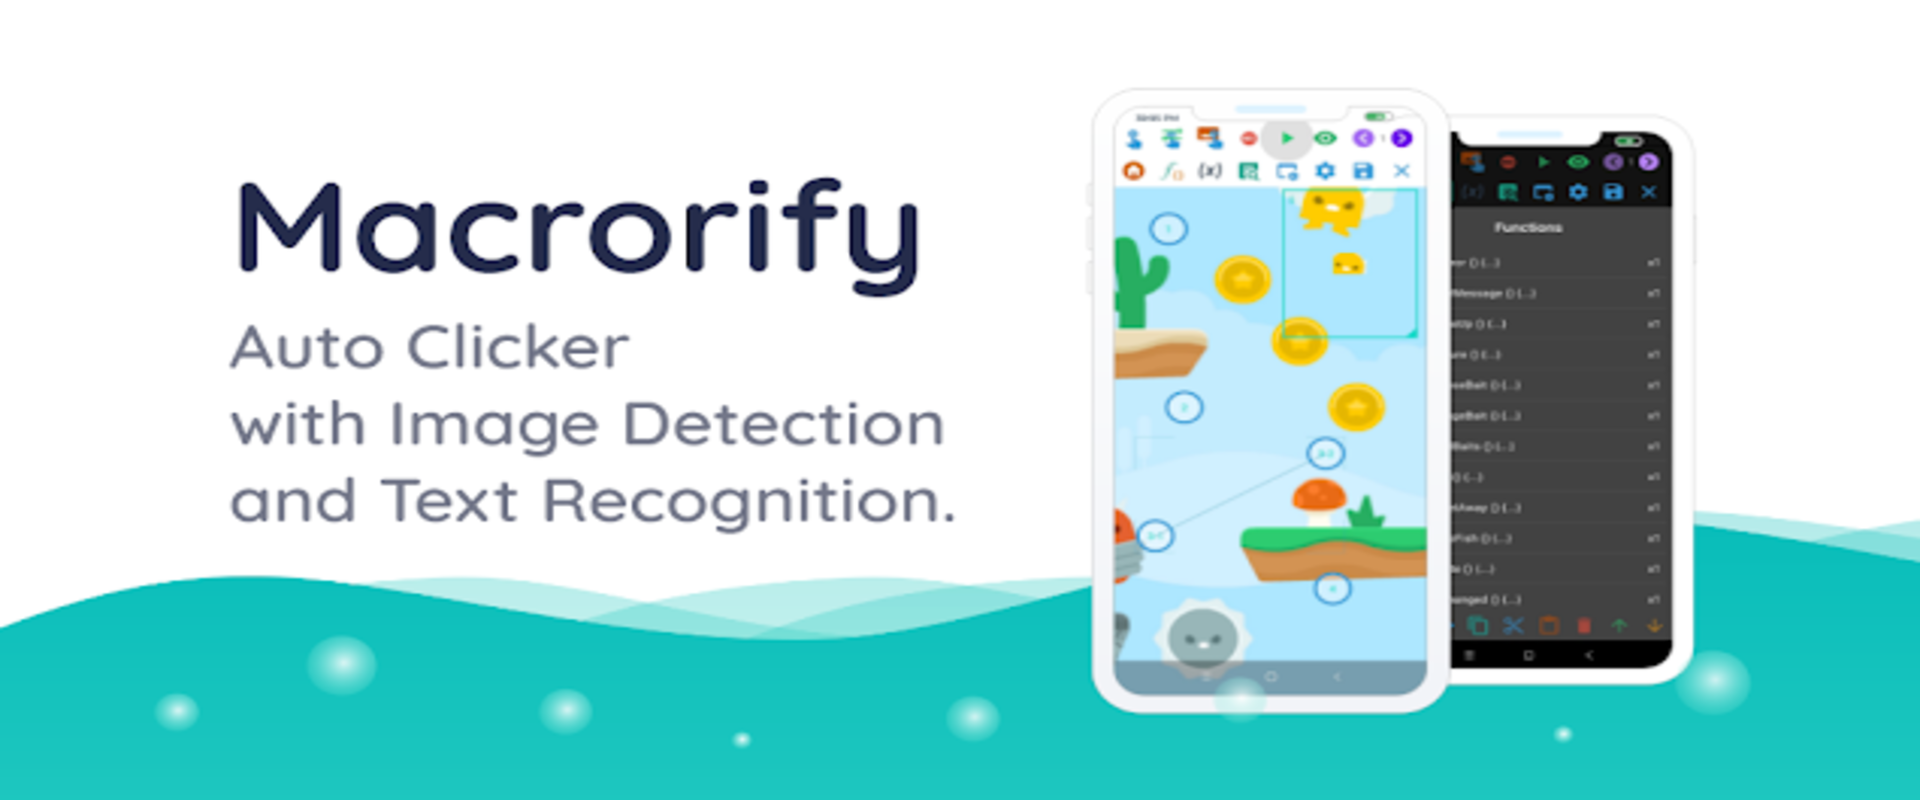 Macrorify - Auto Clicker with Image Detection